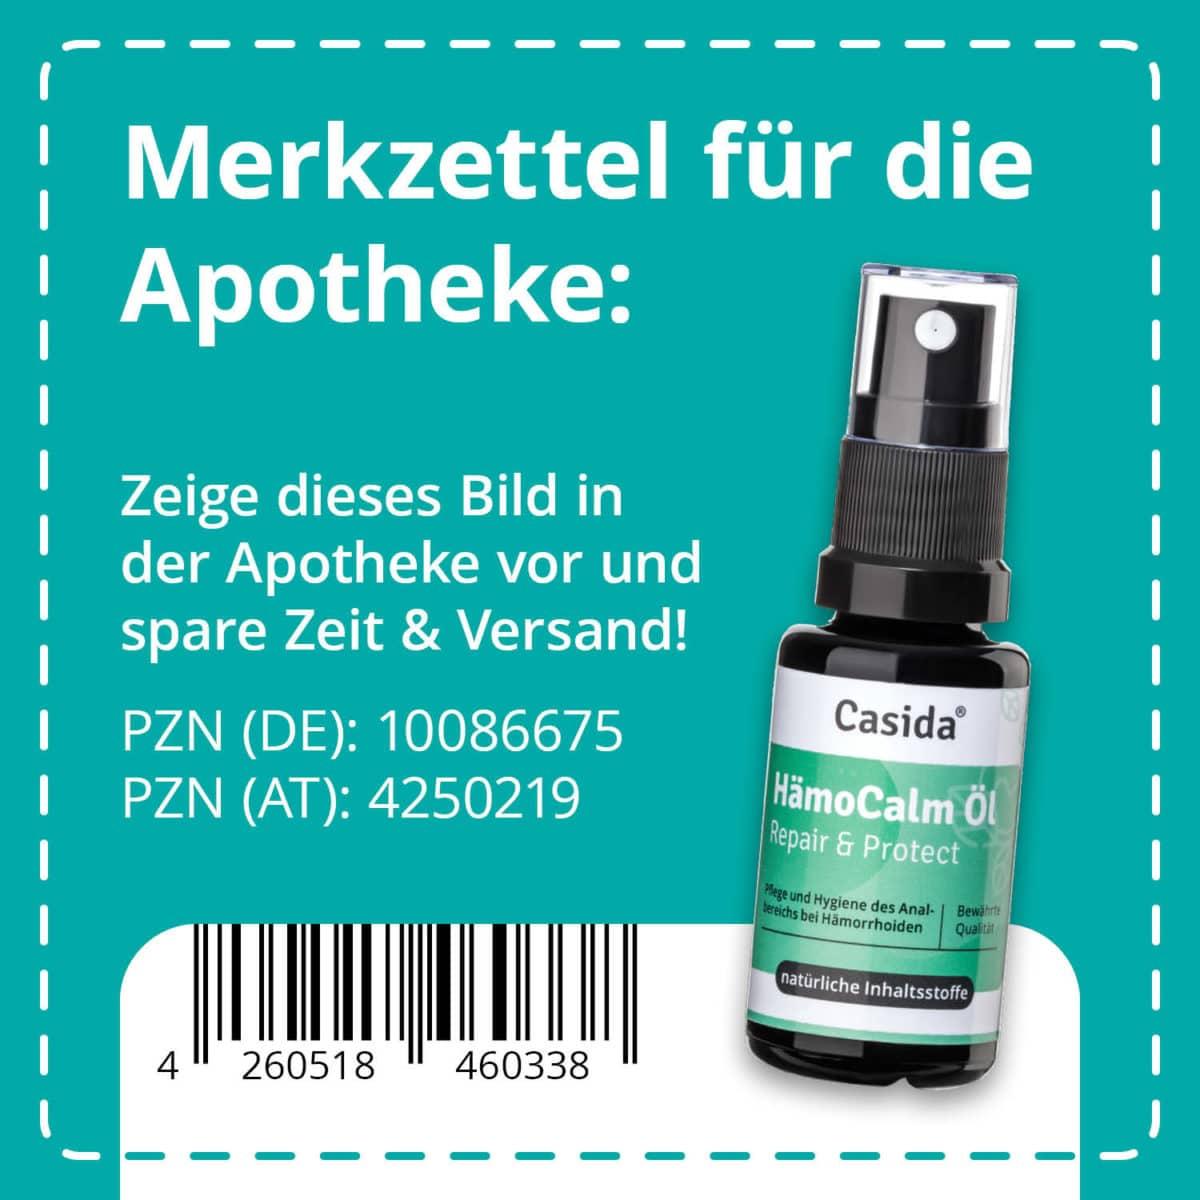 Casida HämoCalm Repair & Protect – 20 ml 10086675 PZN Apotheke hämorrhoiden hämmoritten hemoriden9